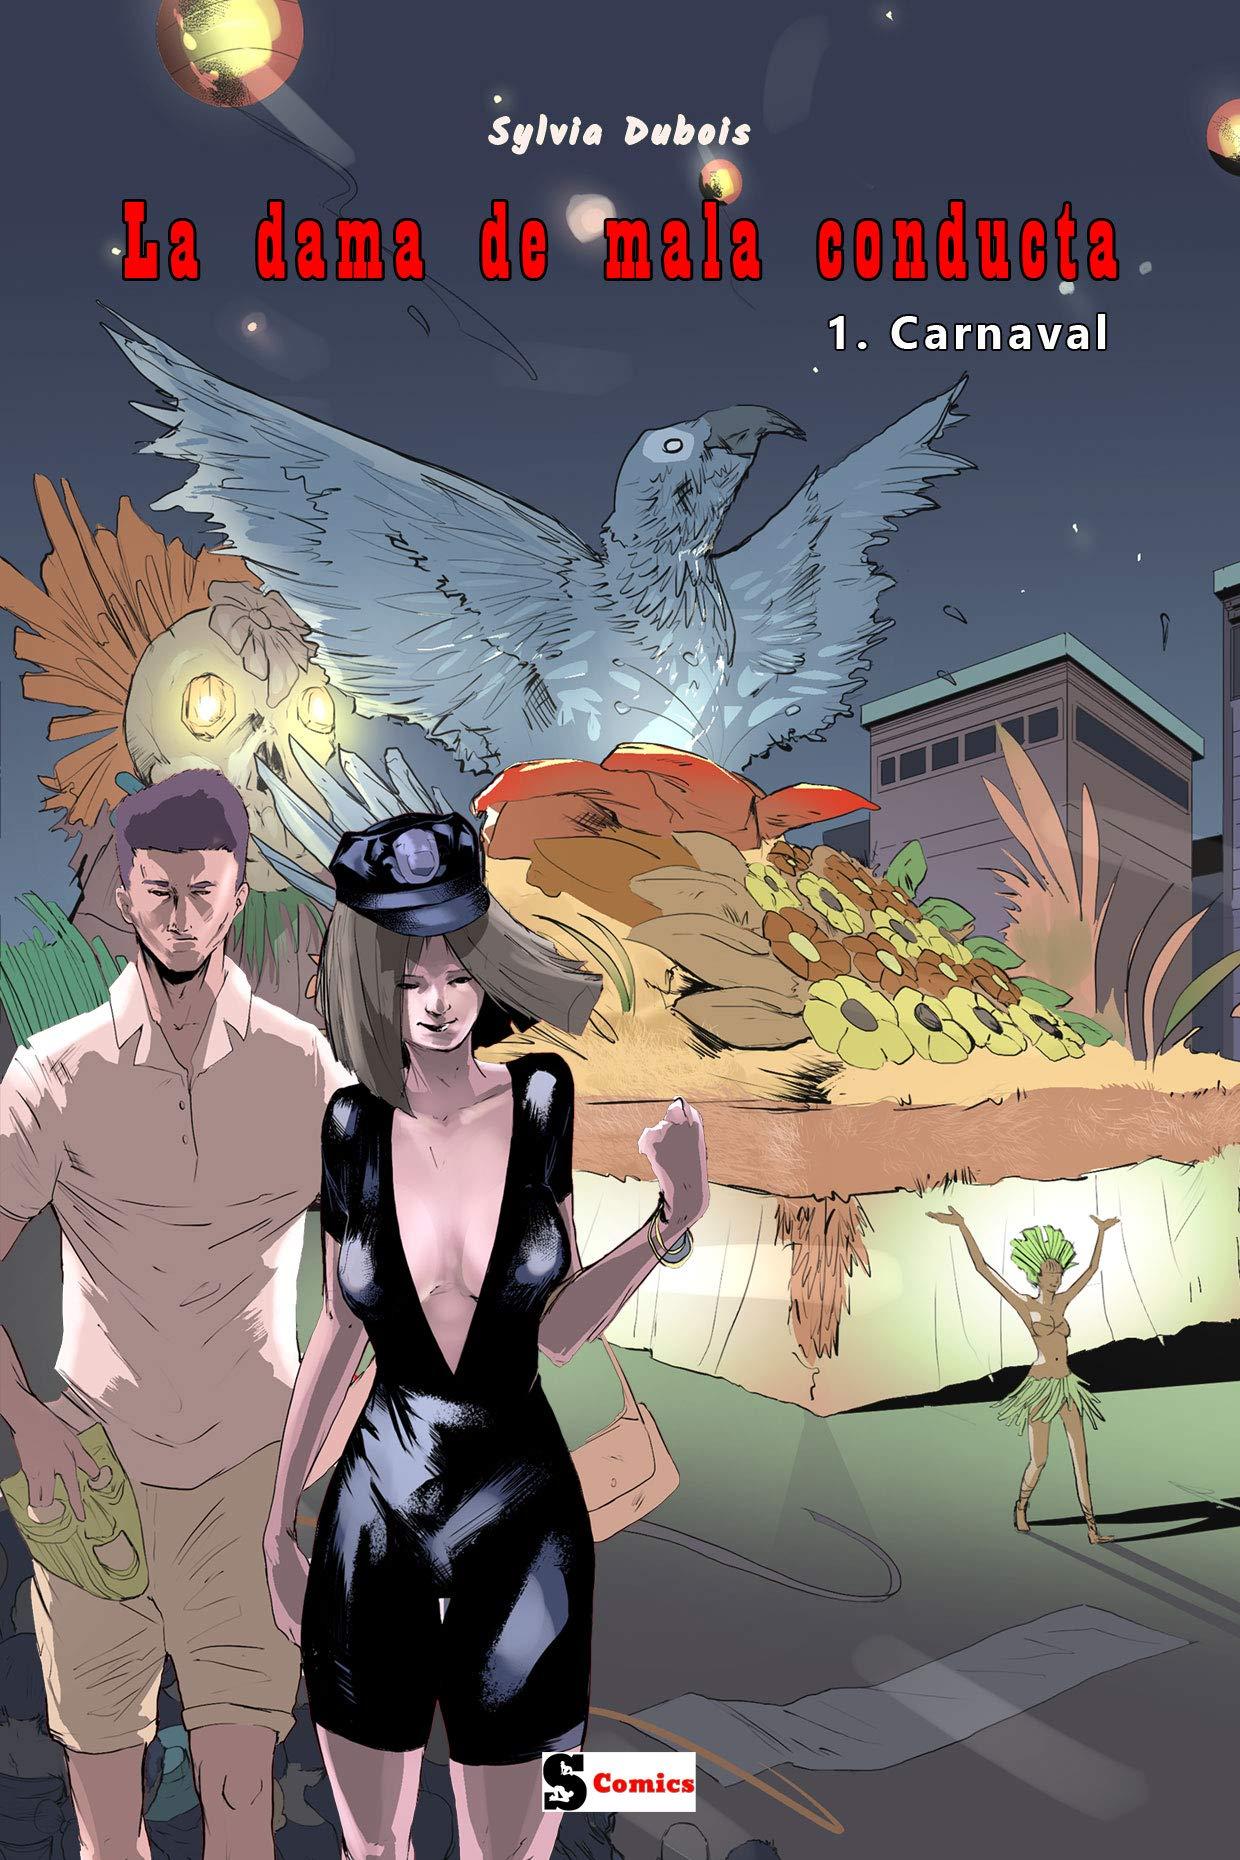 La dama de mala conducta - Carnaval